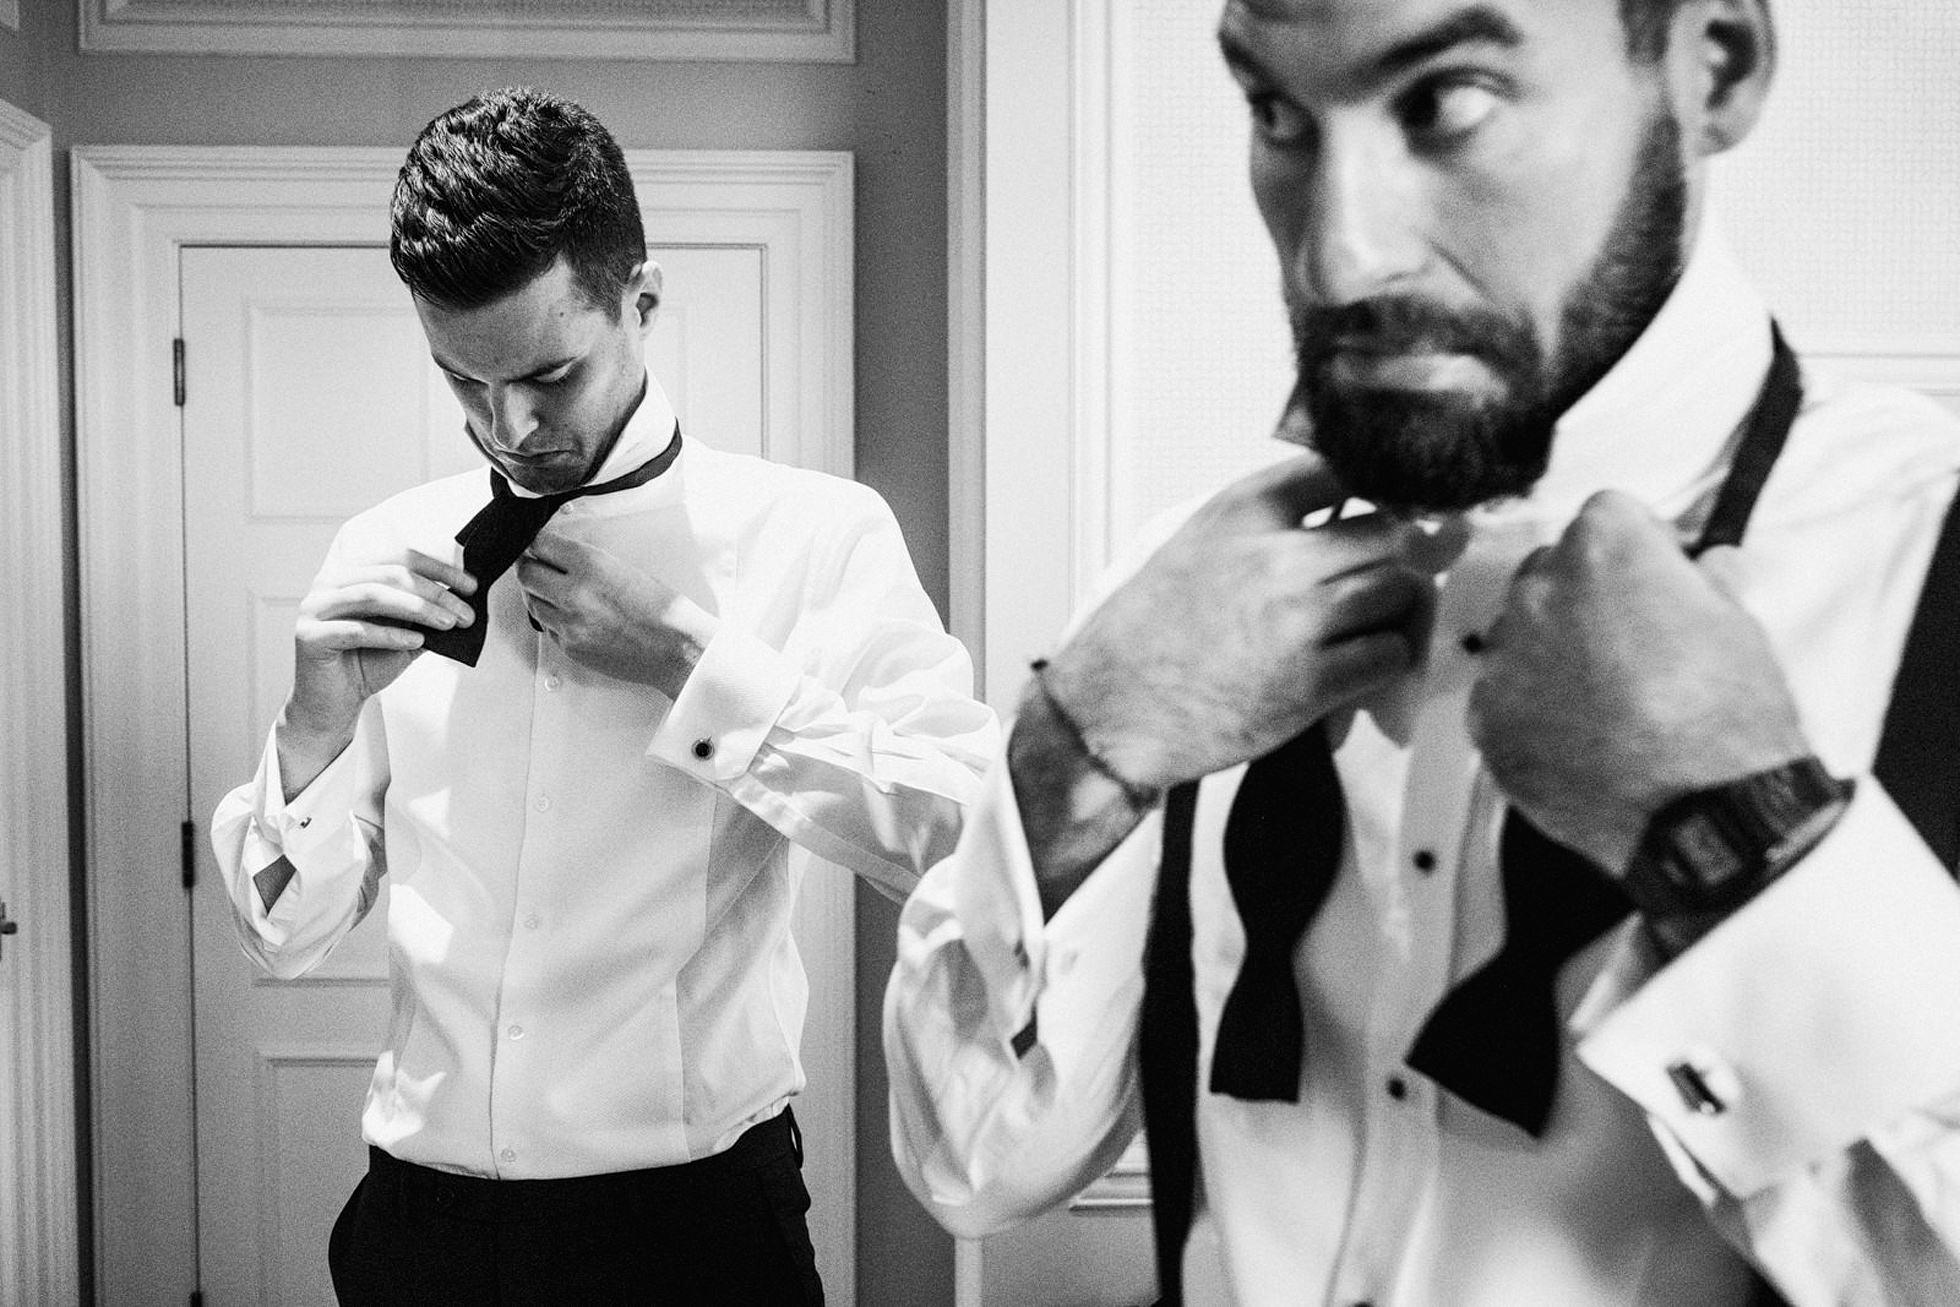 Tying bow ties pre-wedding